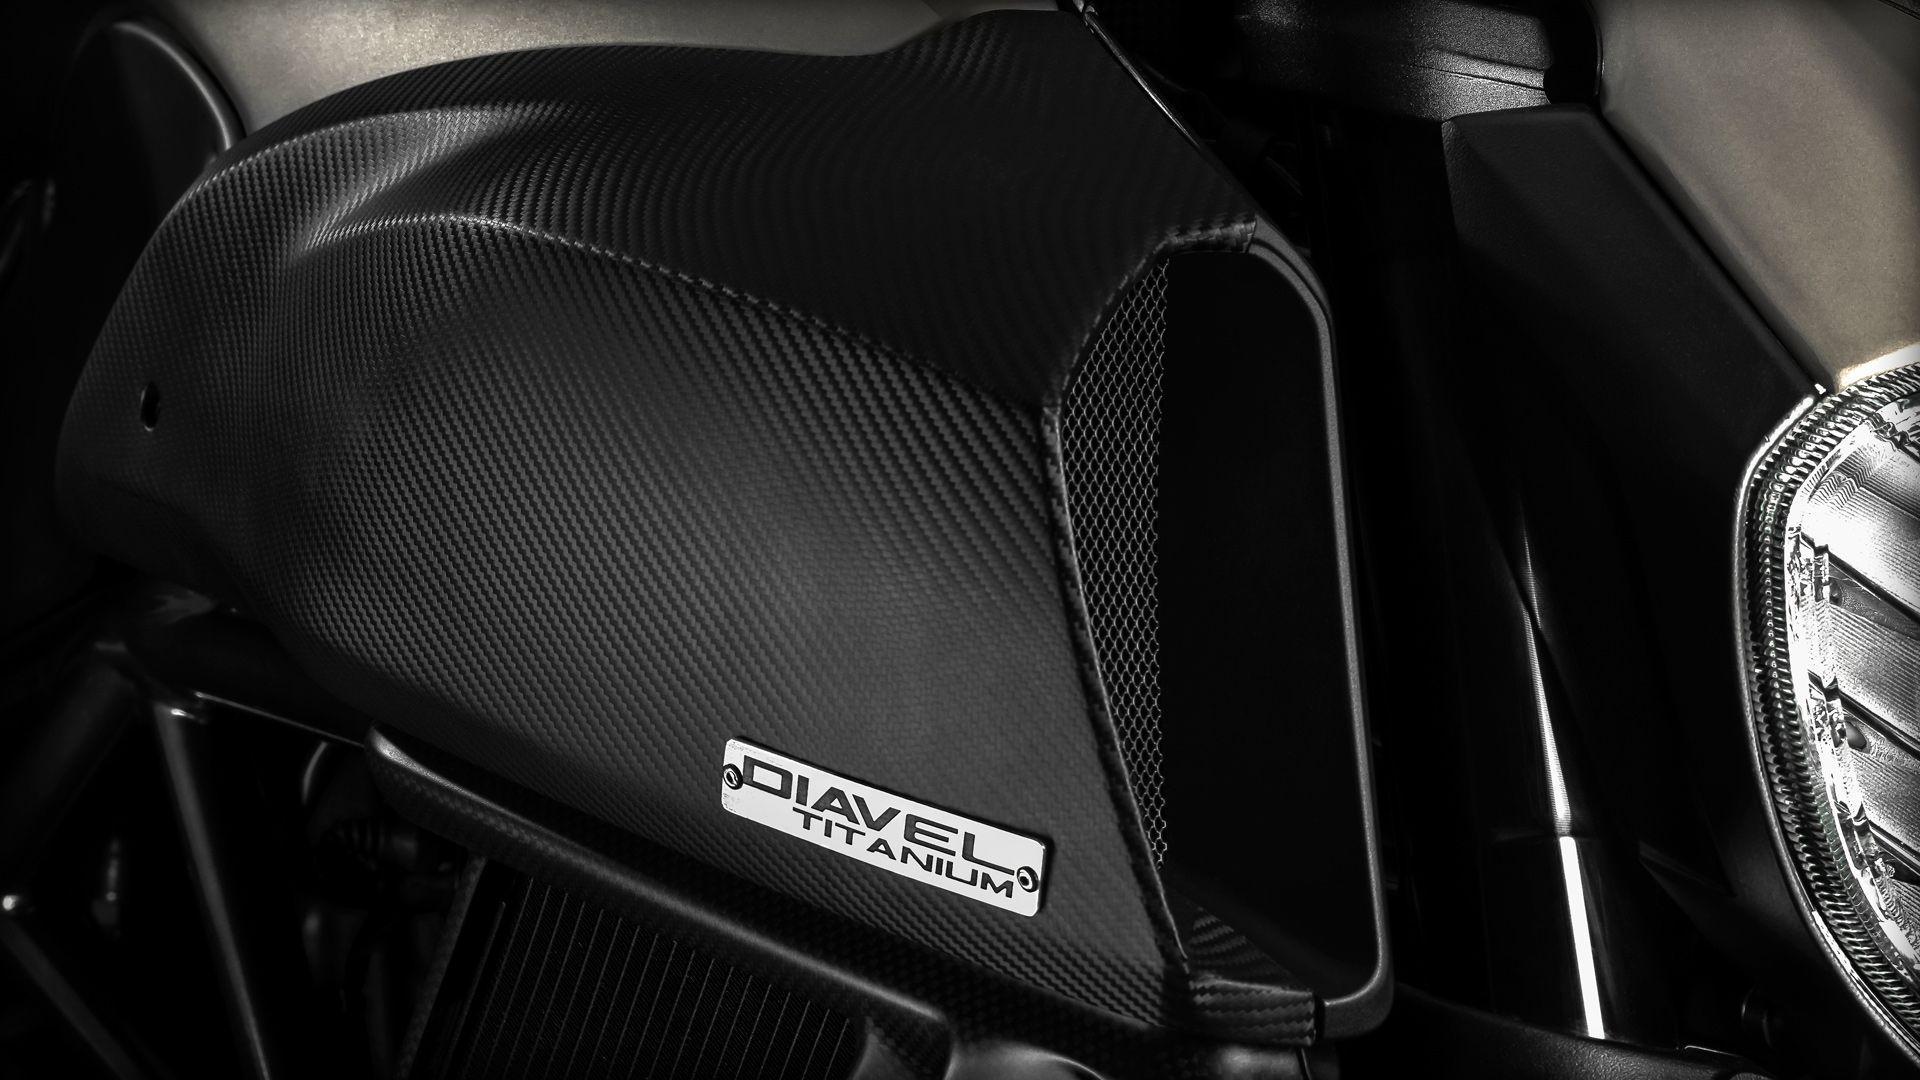 2015 Ducati Diavel Titanium | Diavel Titanium - Ducati Details